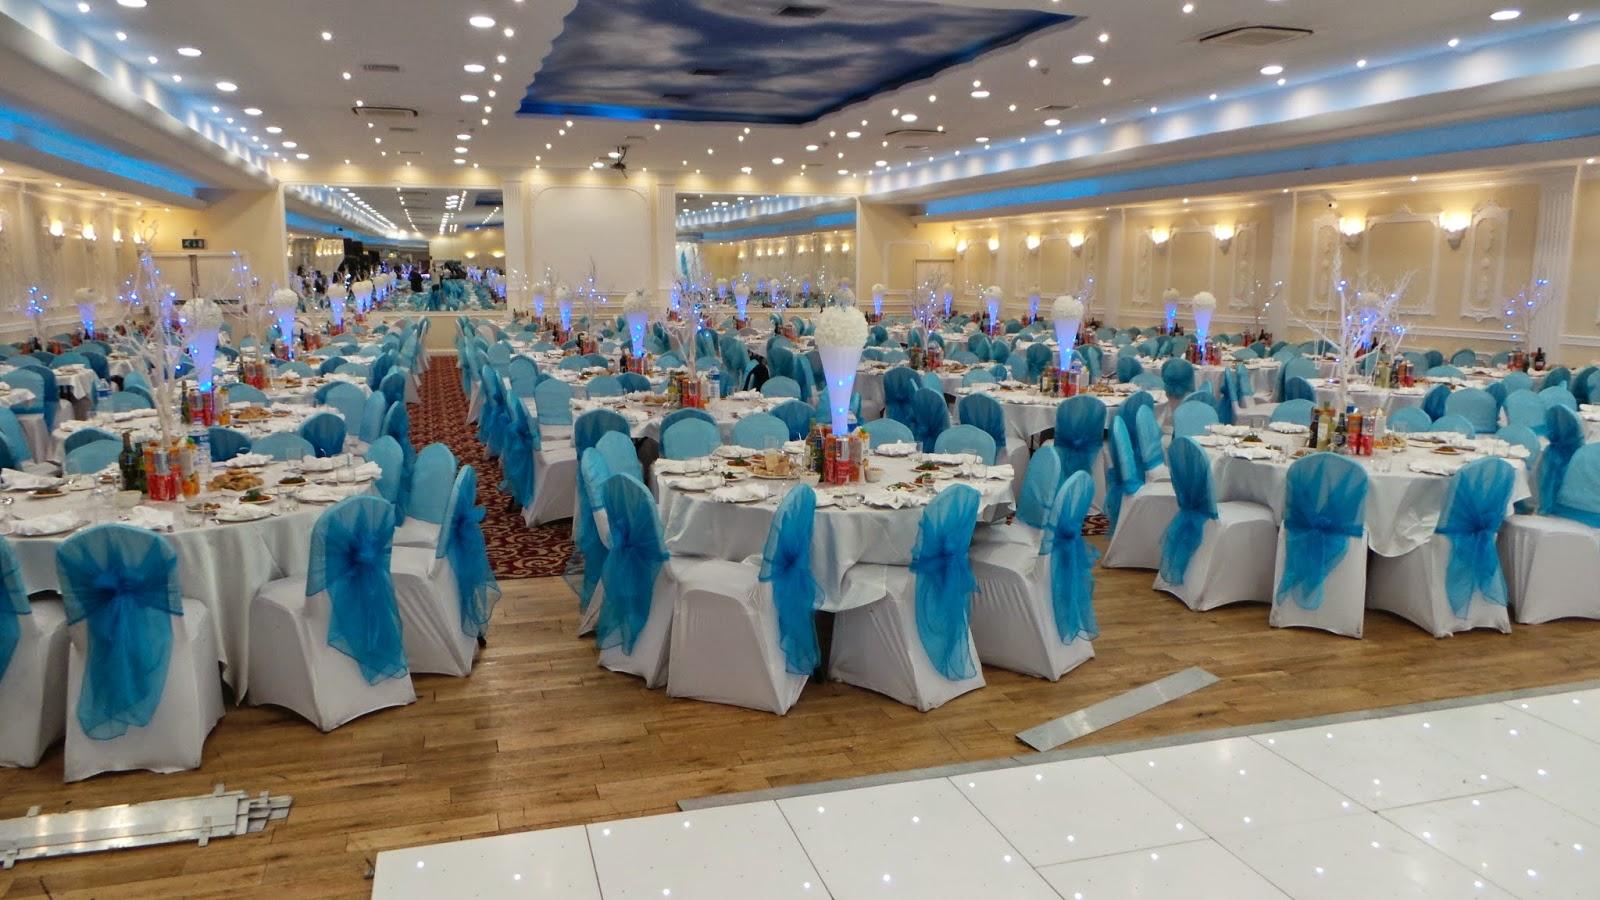 Decorating Ideas For Wedding Halls: Couples World: DECORATIONS